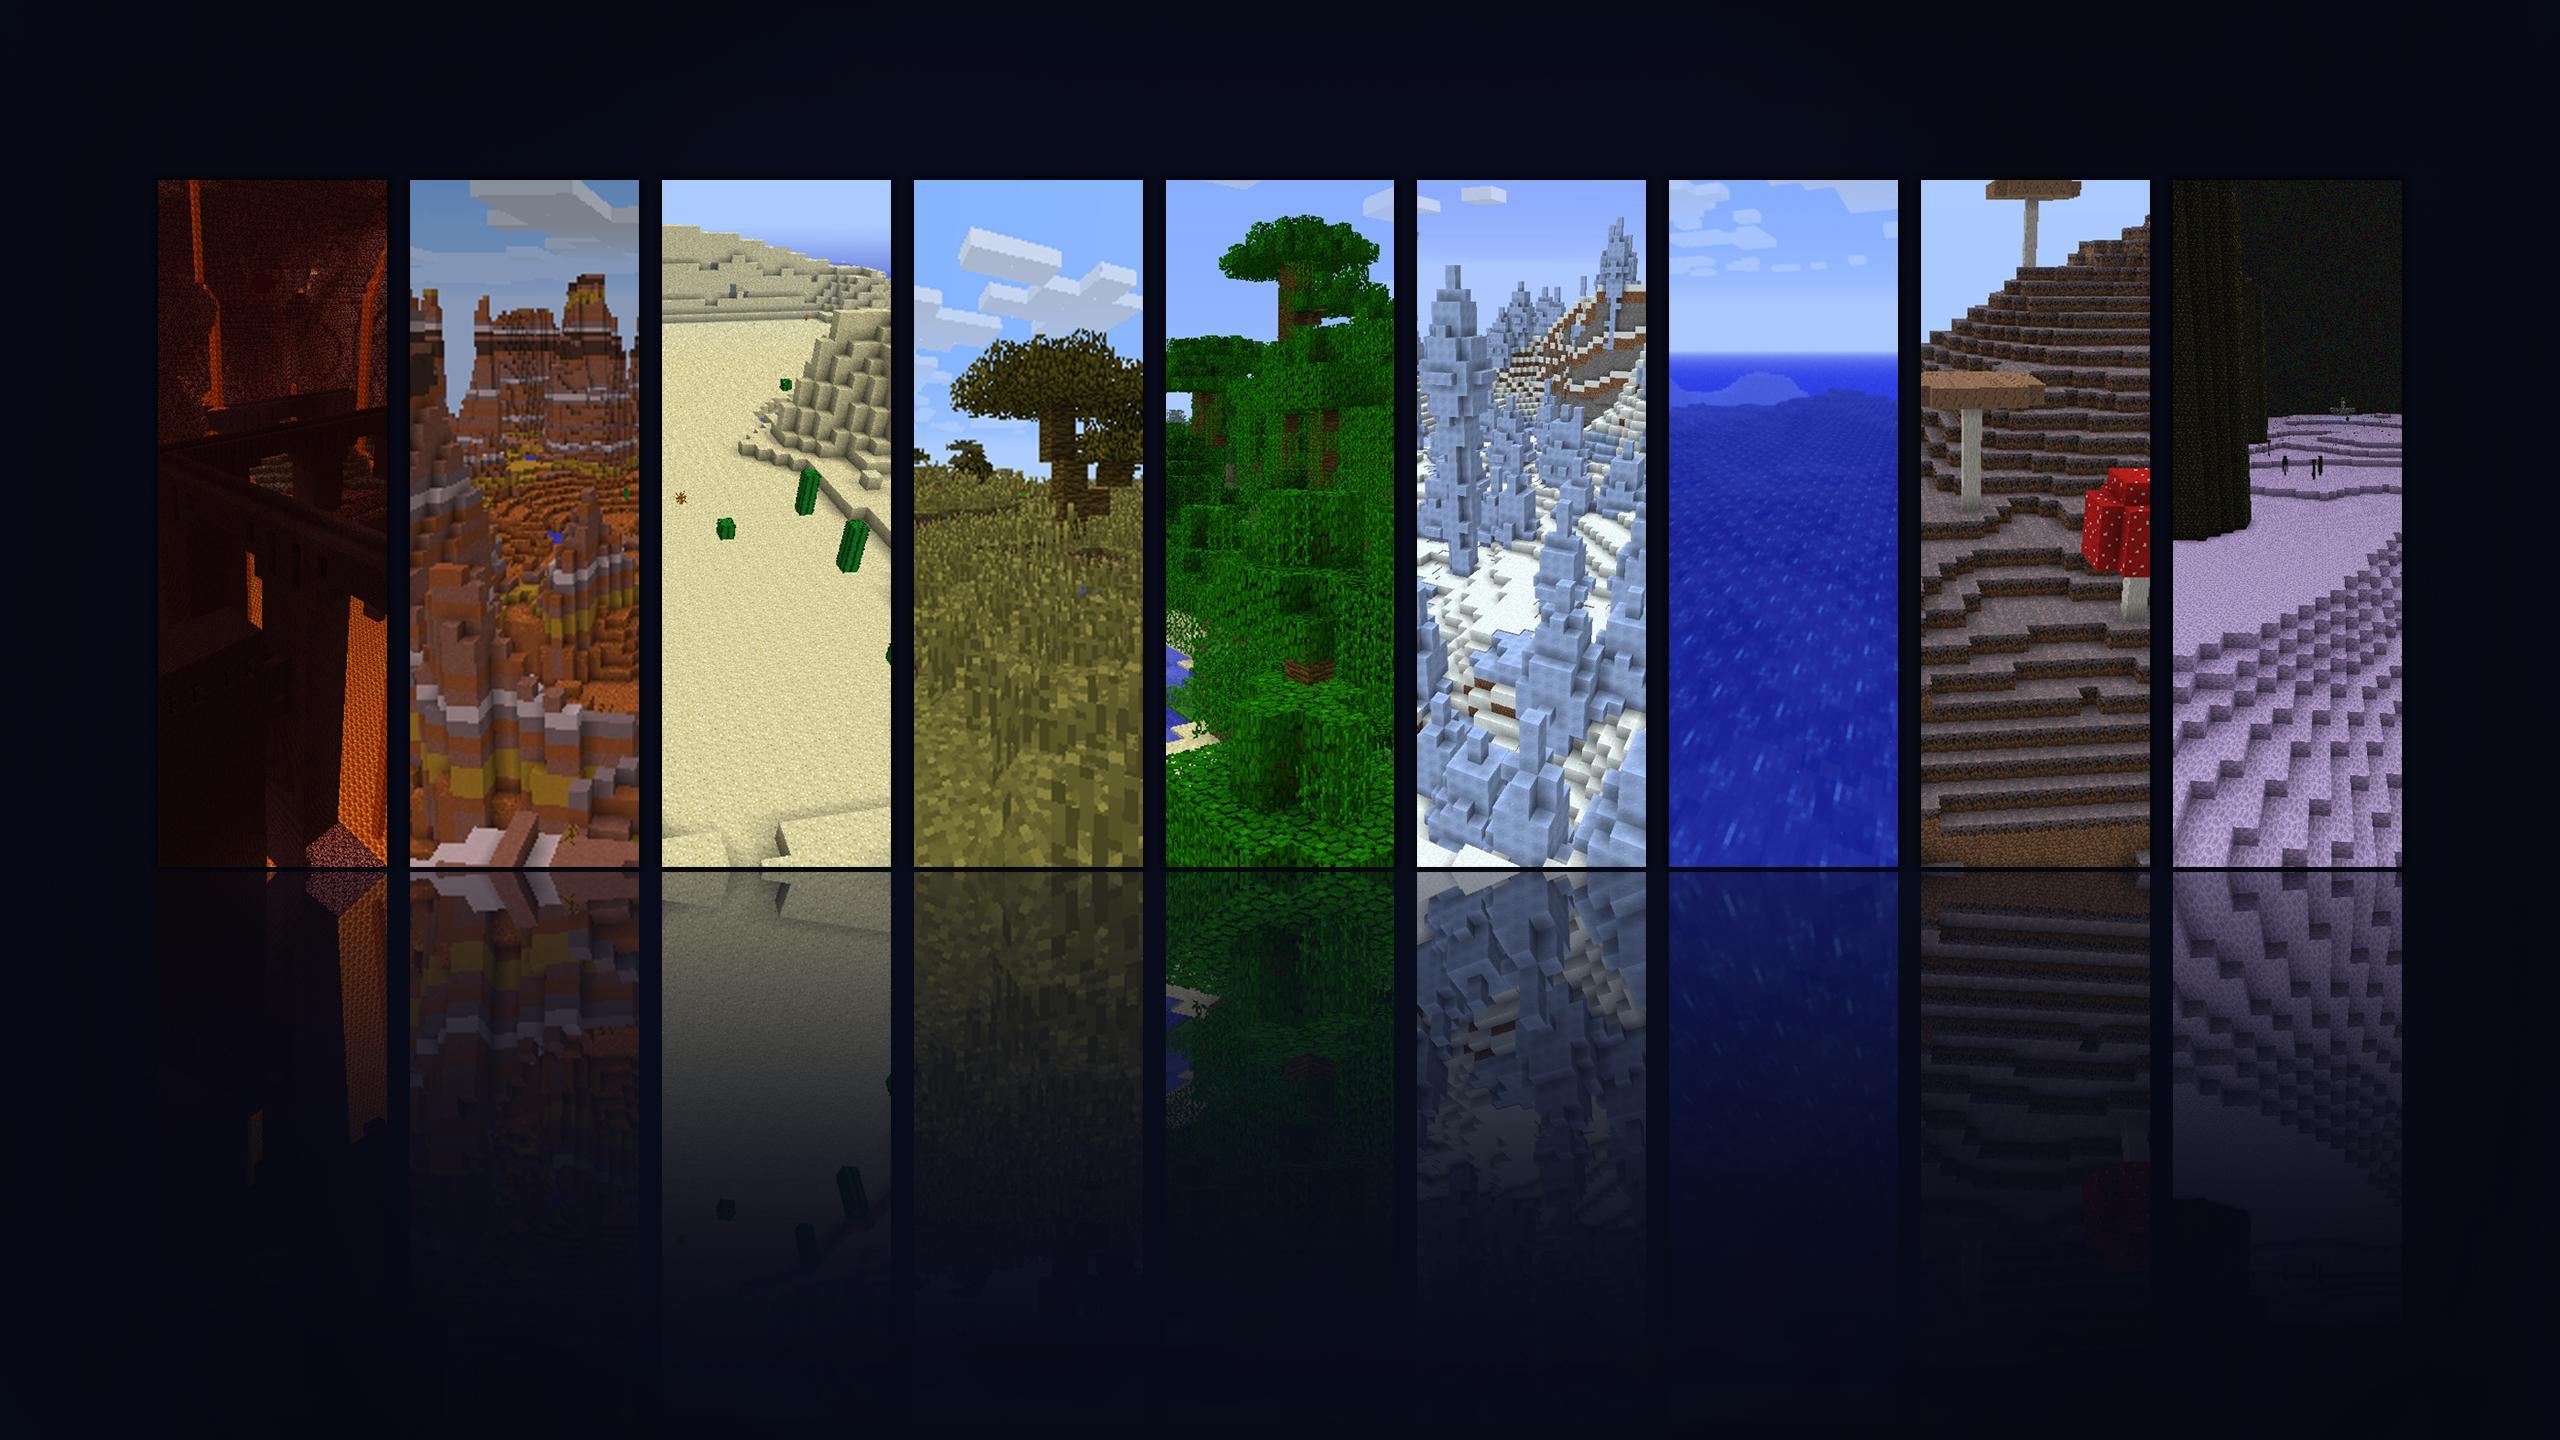 Cool minecraft wallpapers maker wallpapersafari - Minecraft wallpaper creator online ...